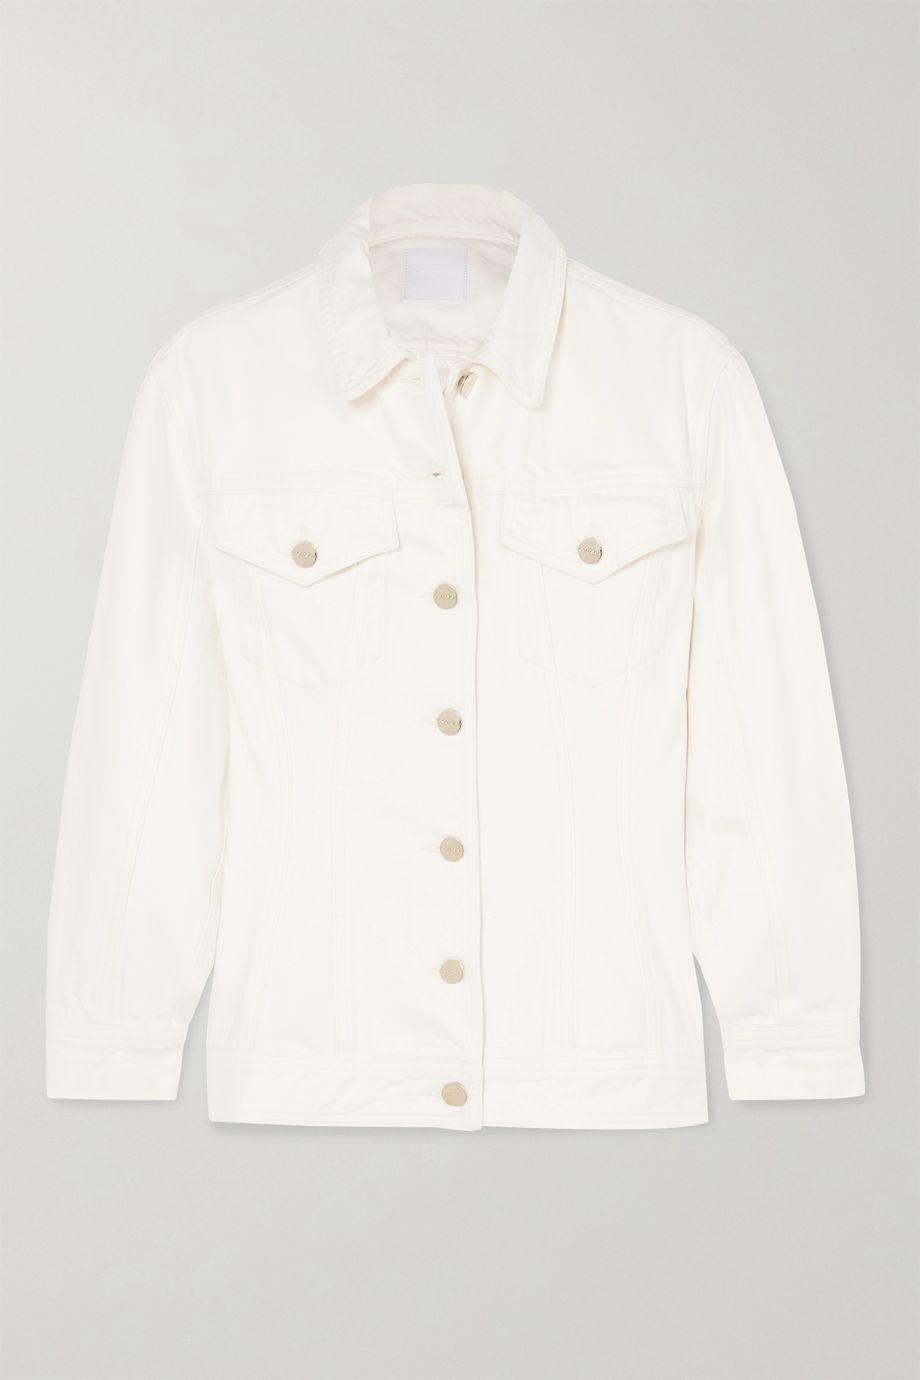 GOLDSIGN The Waisted denim jacket